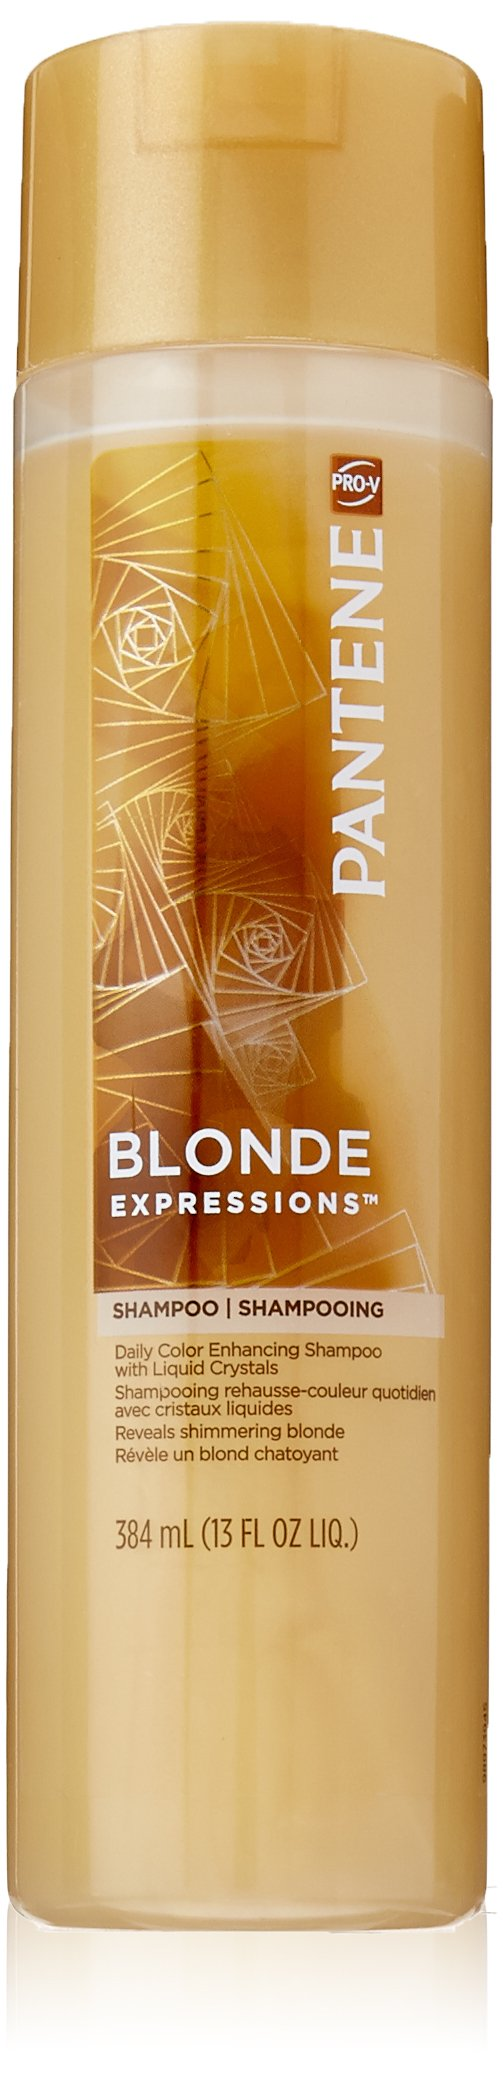 Pantene Blonde Expressions Enhancing Shampoo